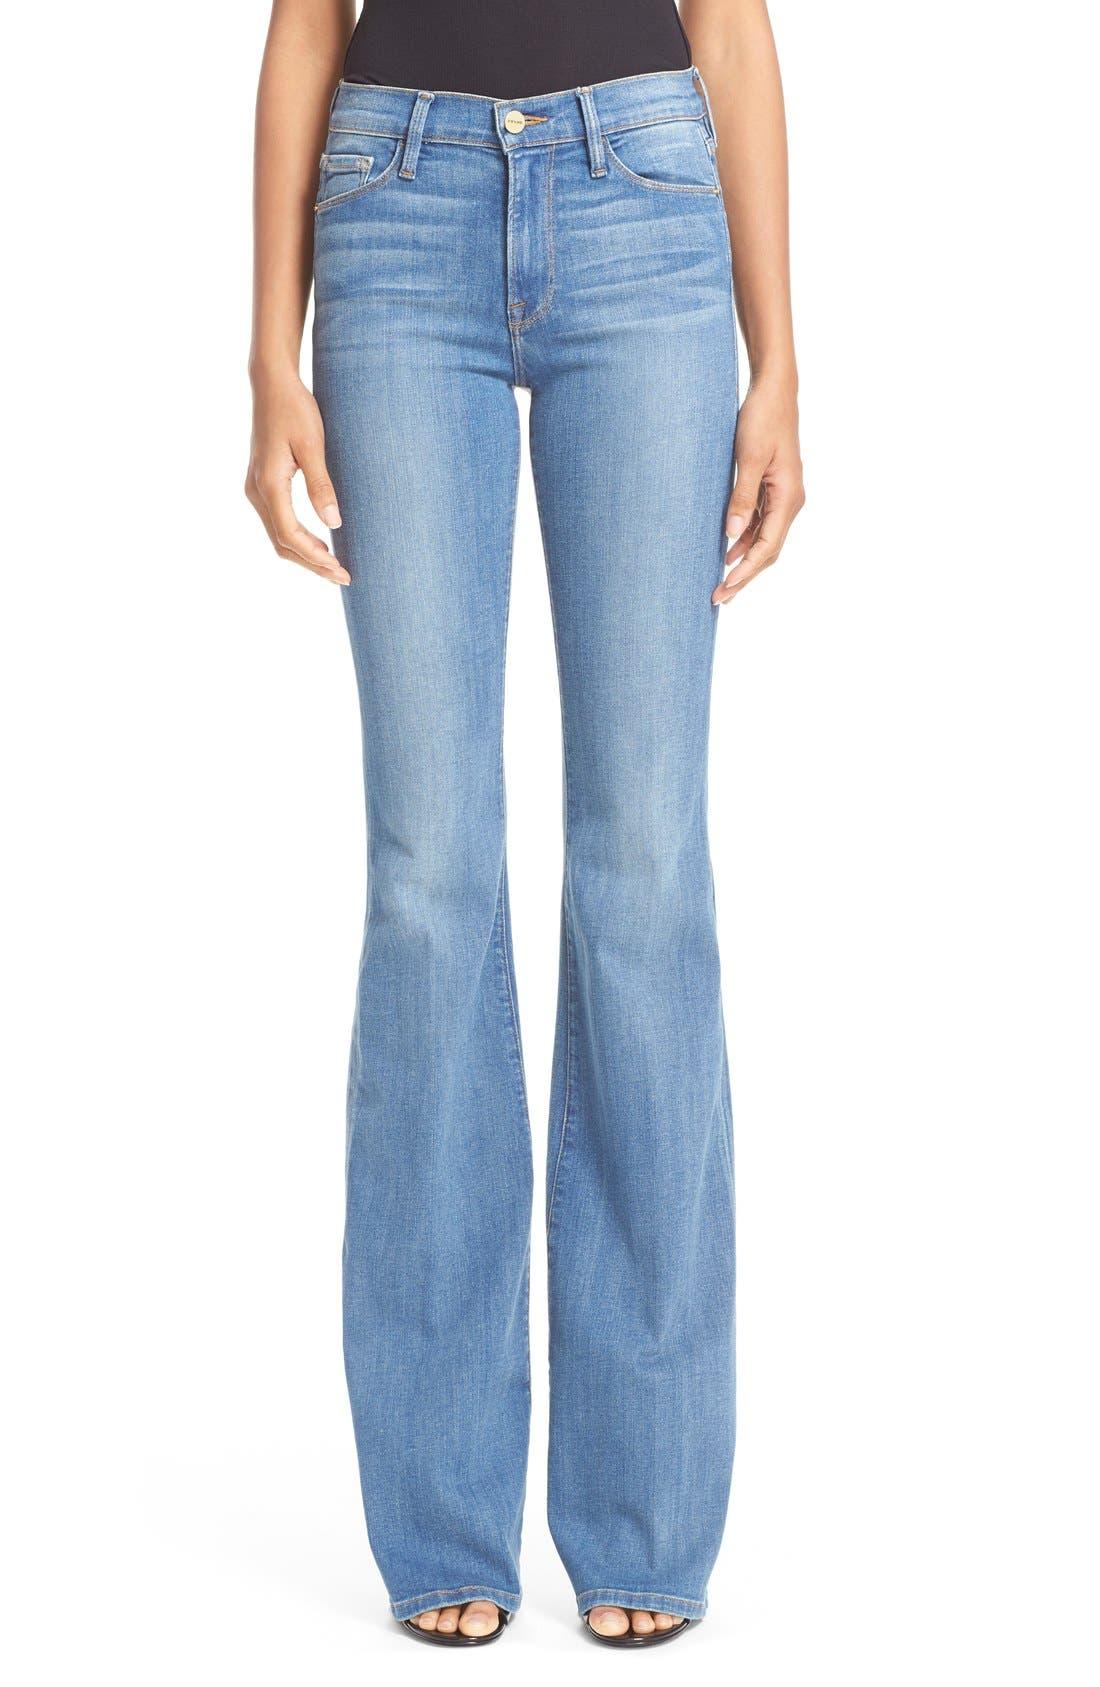 FRAME, Forever Karlie Flare Jeans, Main thumbnail 1, color, 401